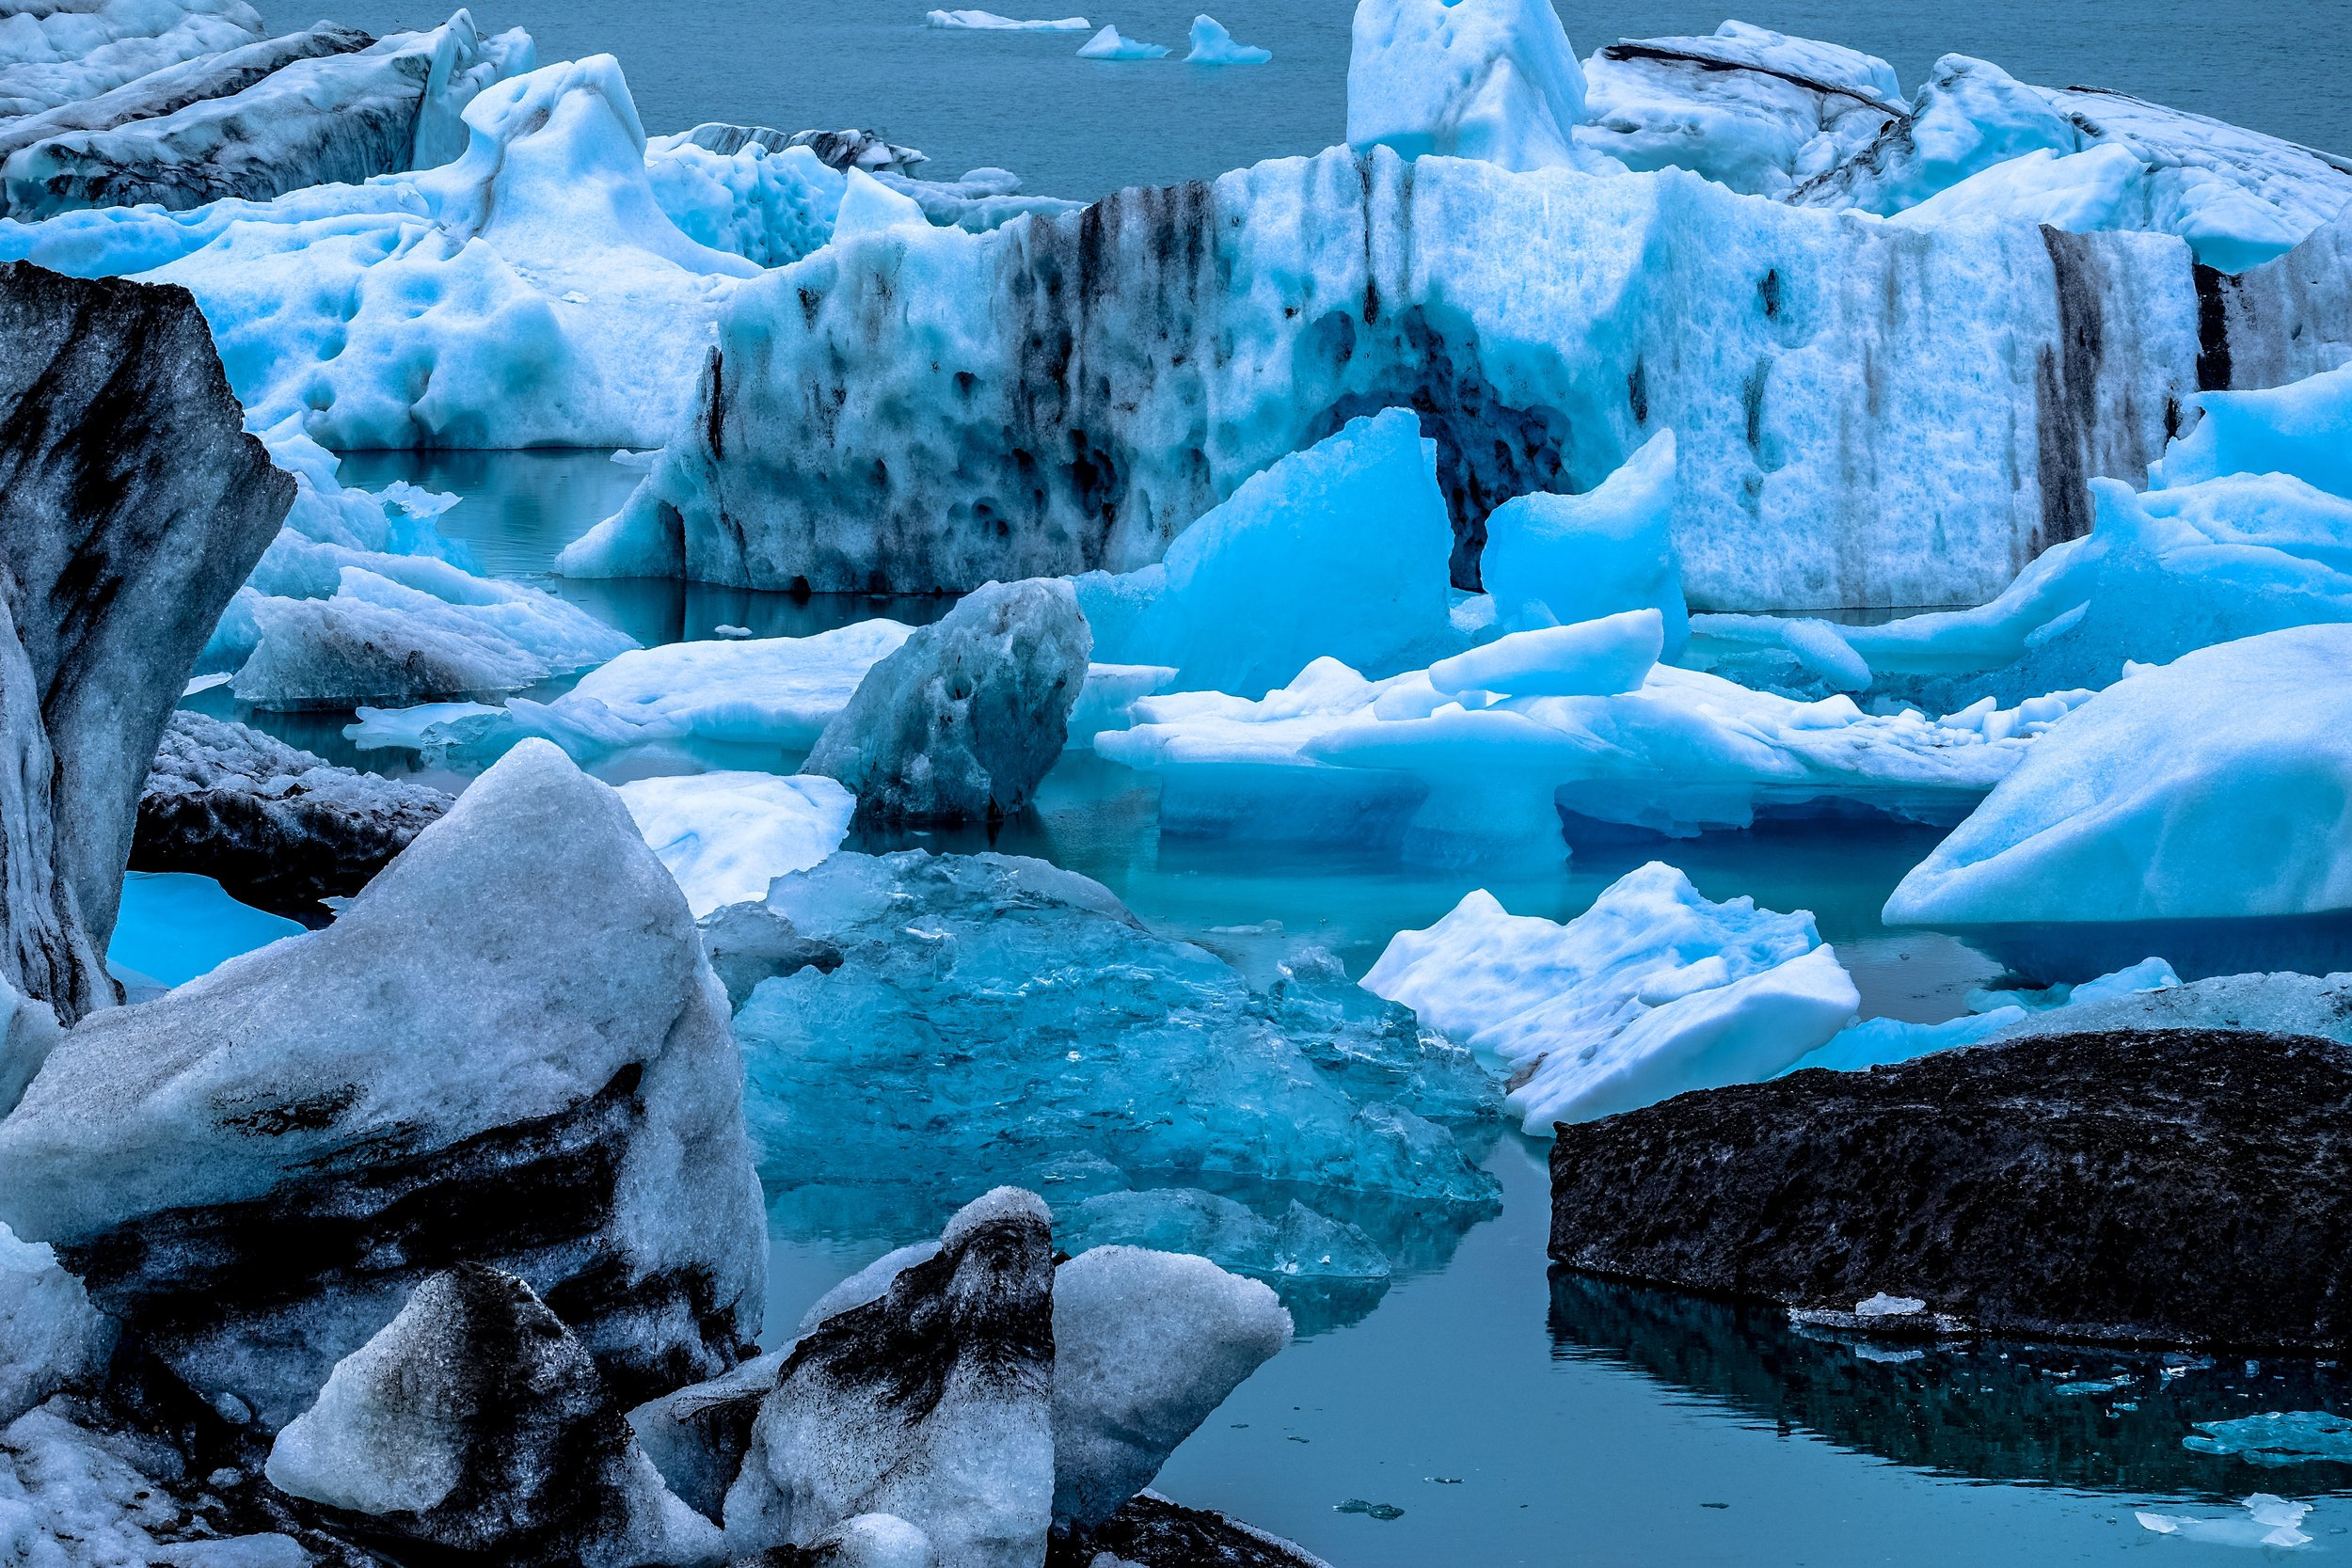 climate-change-cold-floating-464365.jpg